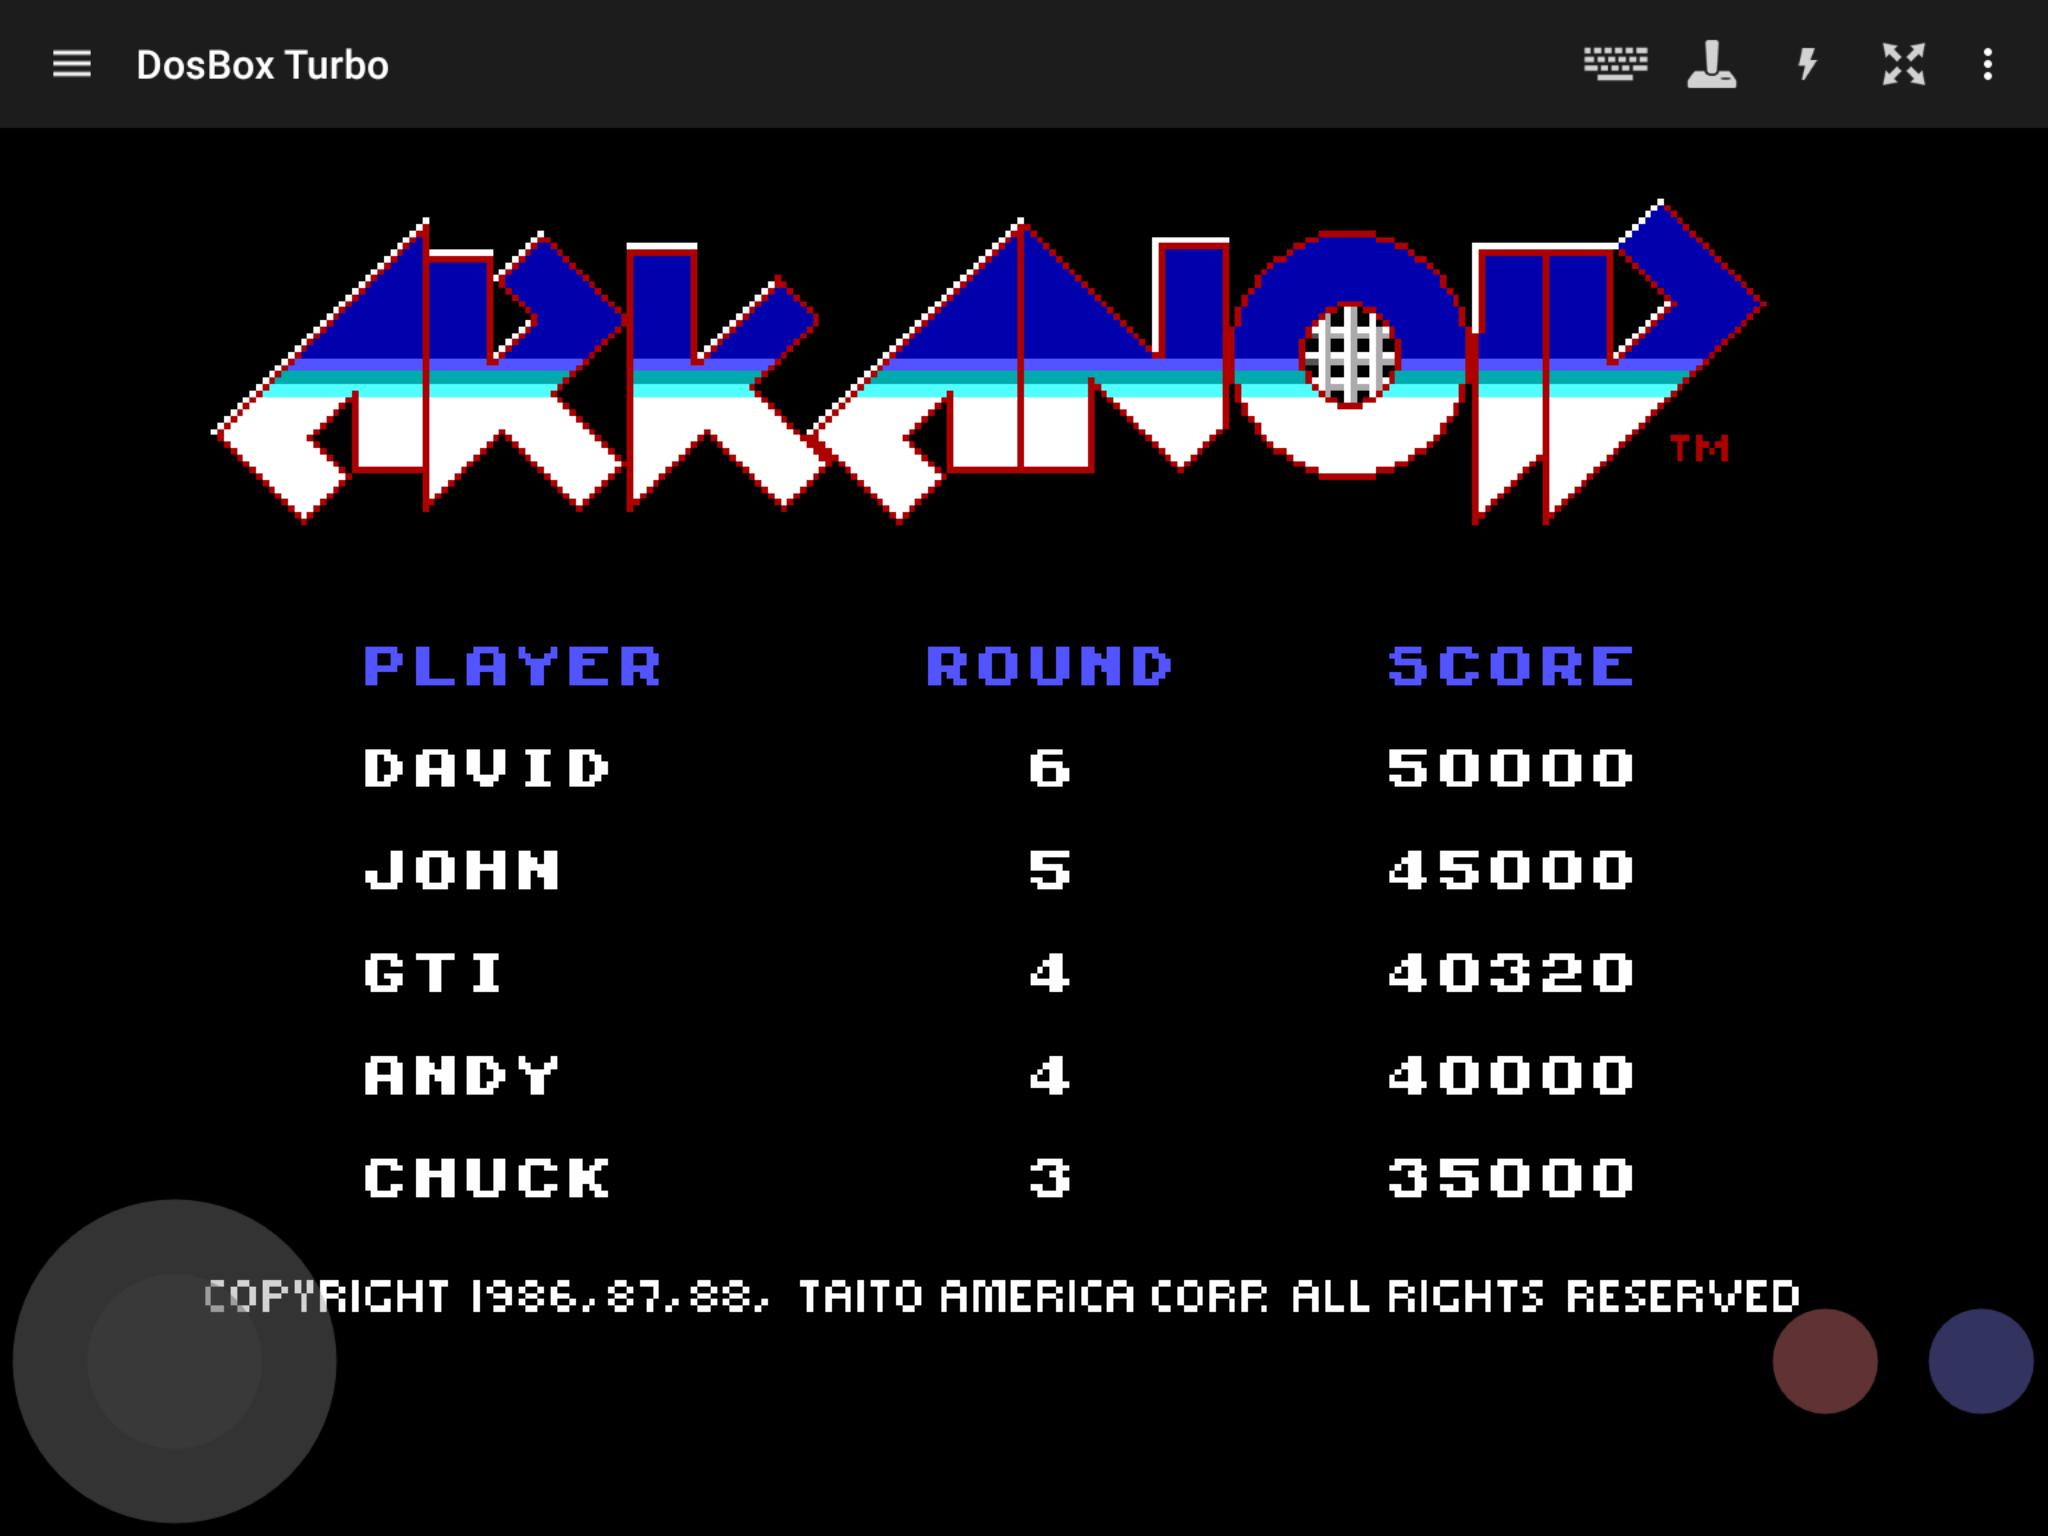 GTibel: Arkanoid (PC Emulated / DOSBox) 40,320 points on 2019-02-03 11:41:05